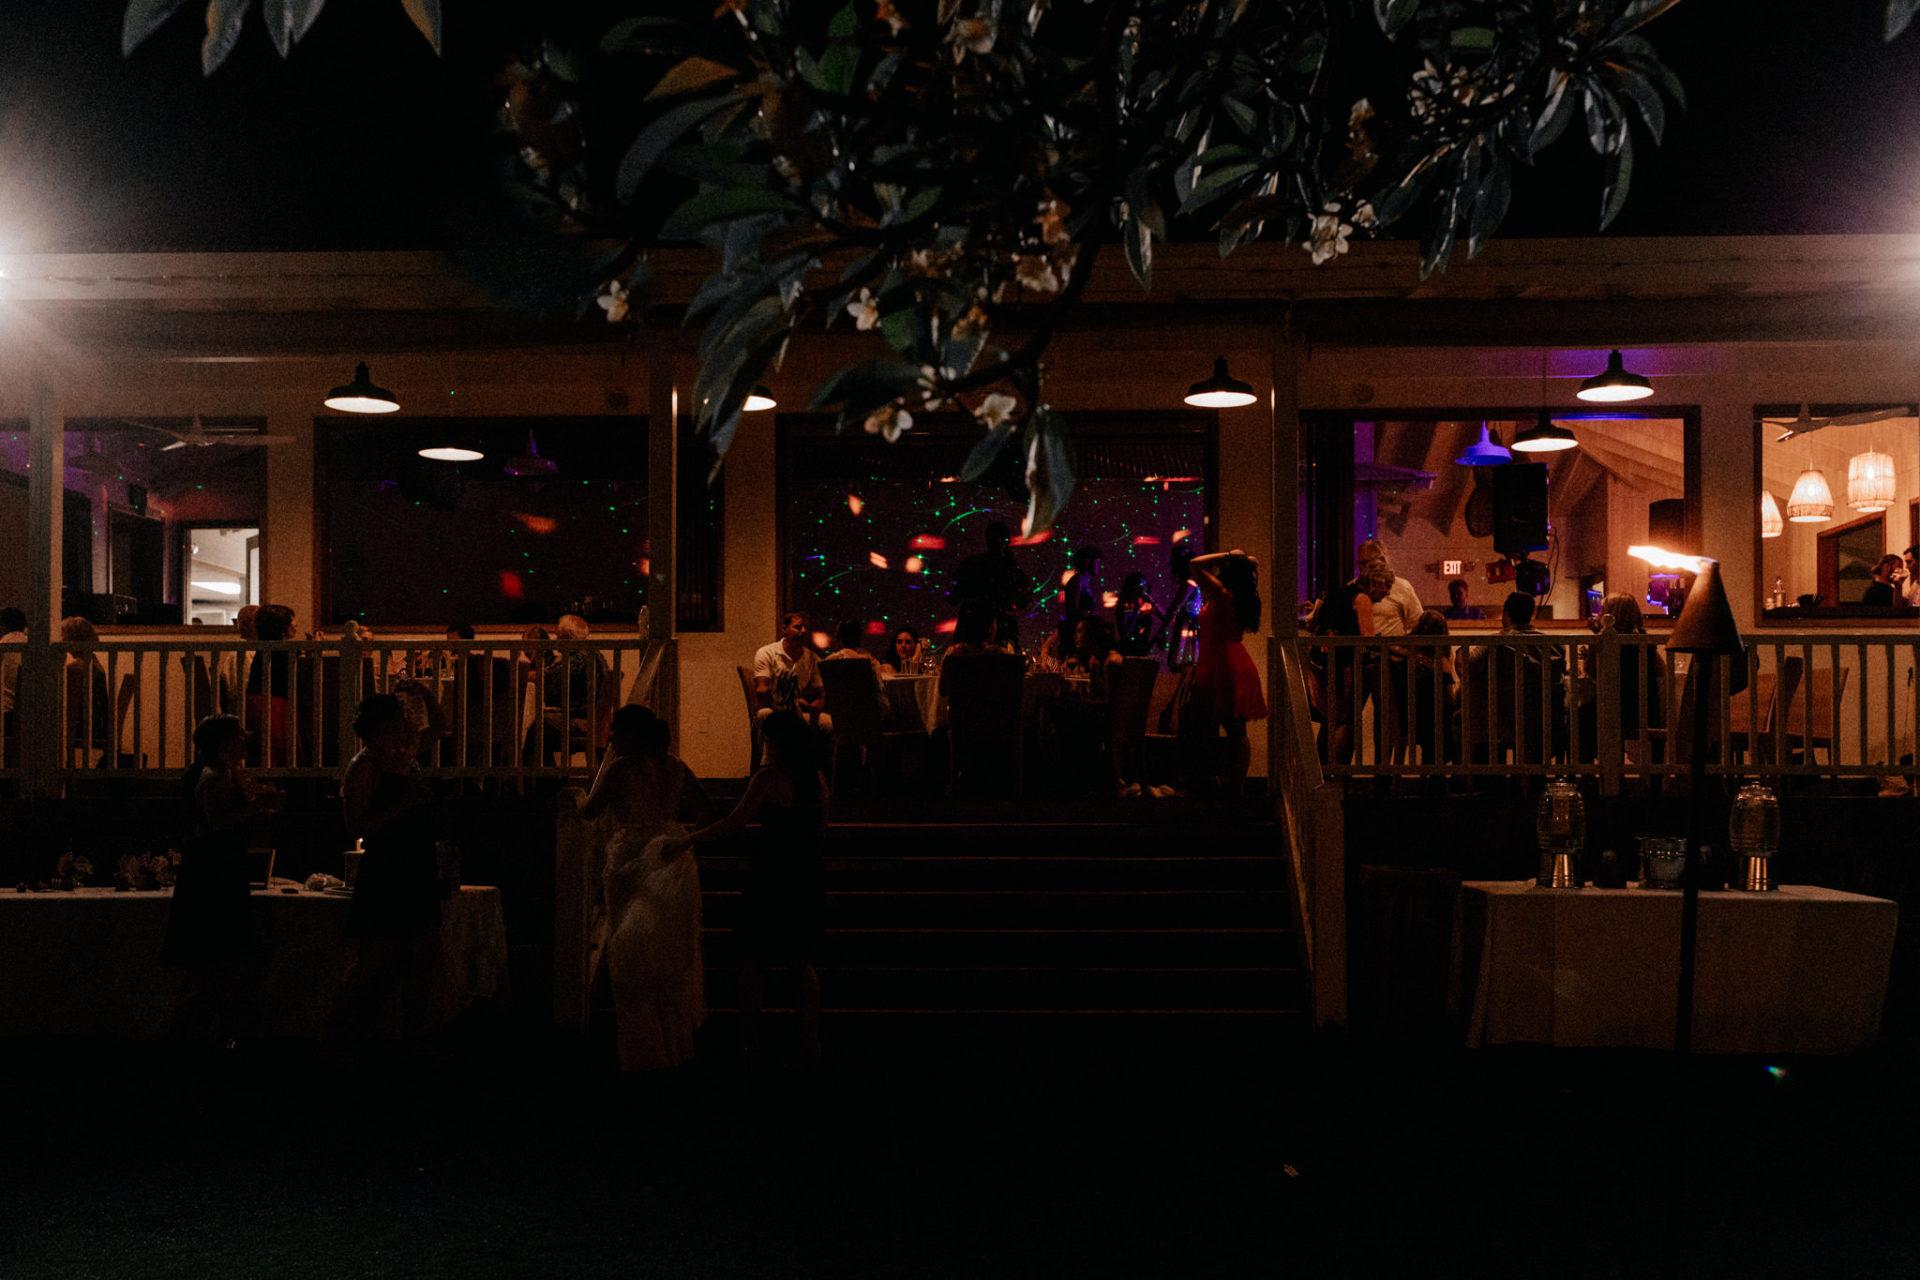 Hawaii Hochzeit-destination wedding kauai-Plantation Gardens Koloa Poipu-Party